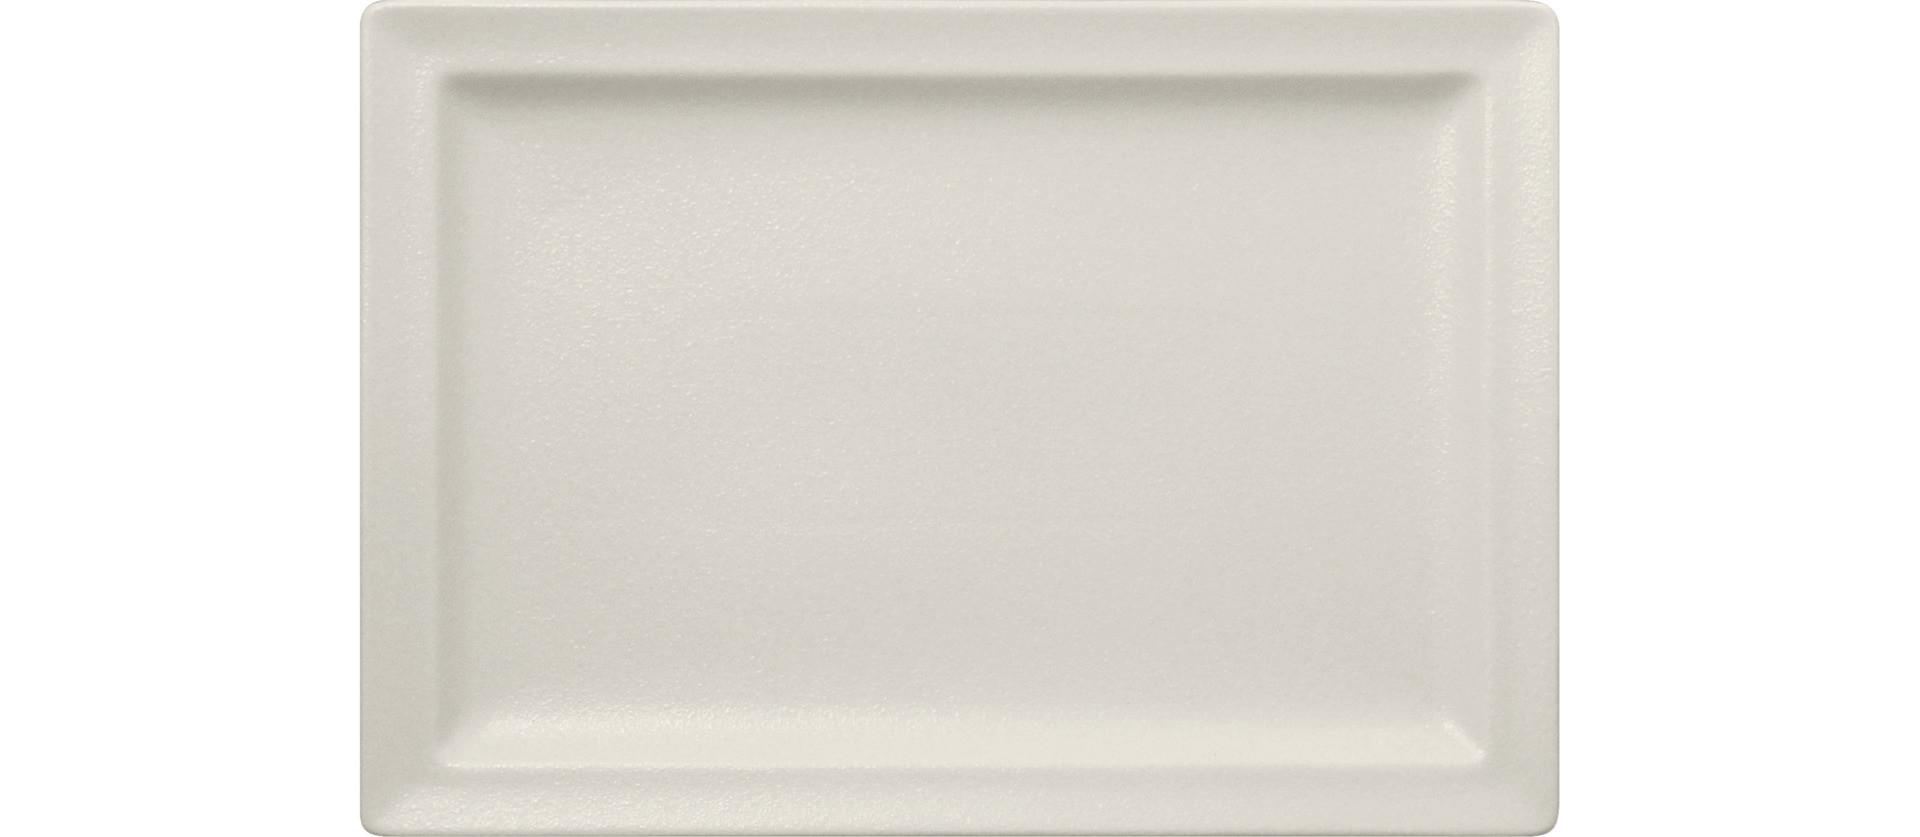 rak neo fusion teller flach rechteckig 330x230 mm wei hinsche gastrowelt. Black Bedroom Furniture Sets. Home Design Ideas